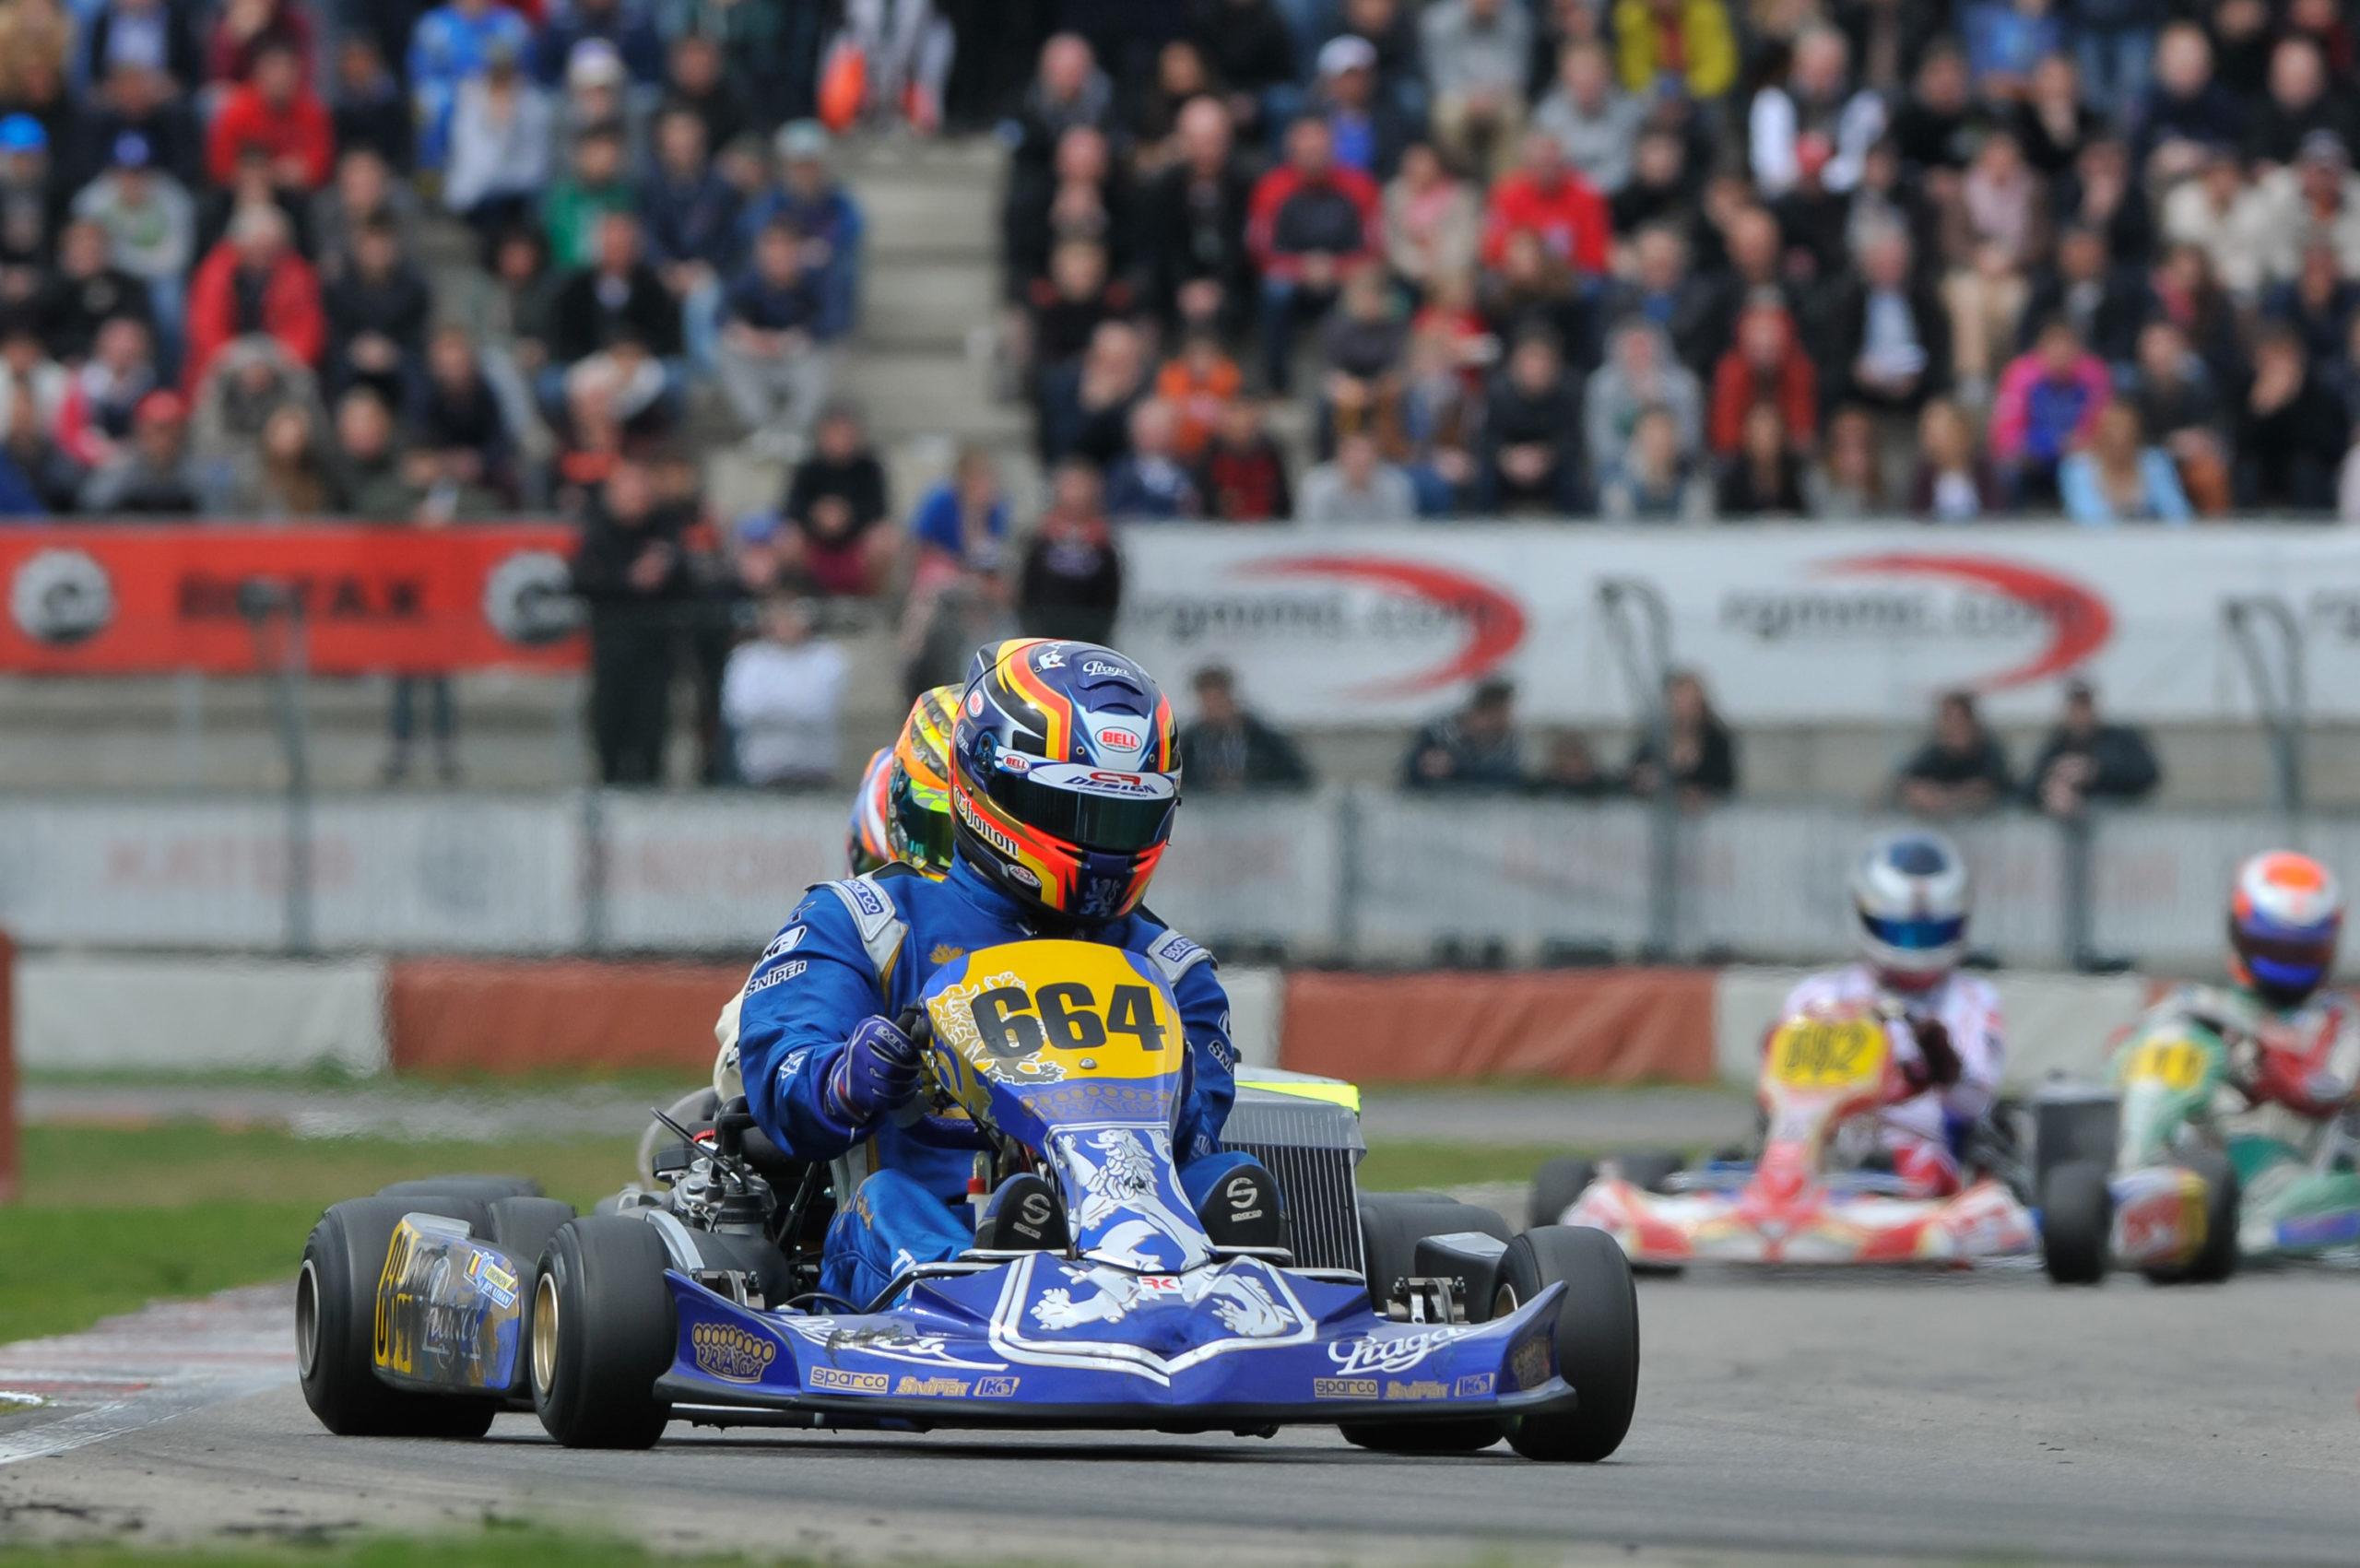 Praga gets podium in Rotax Euro Challenge